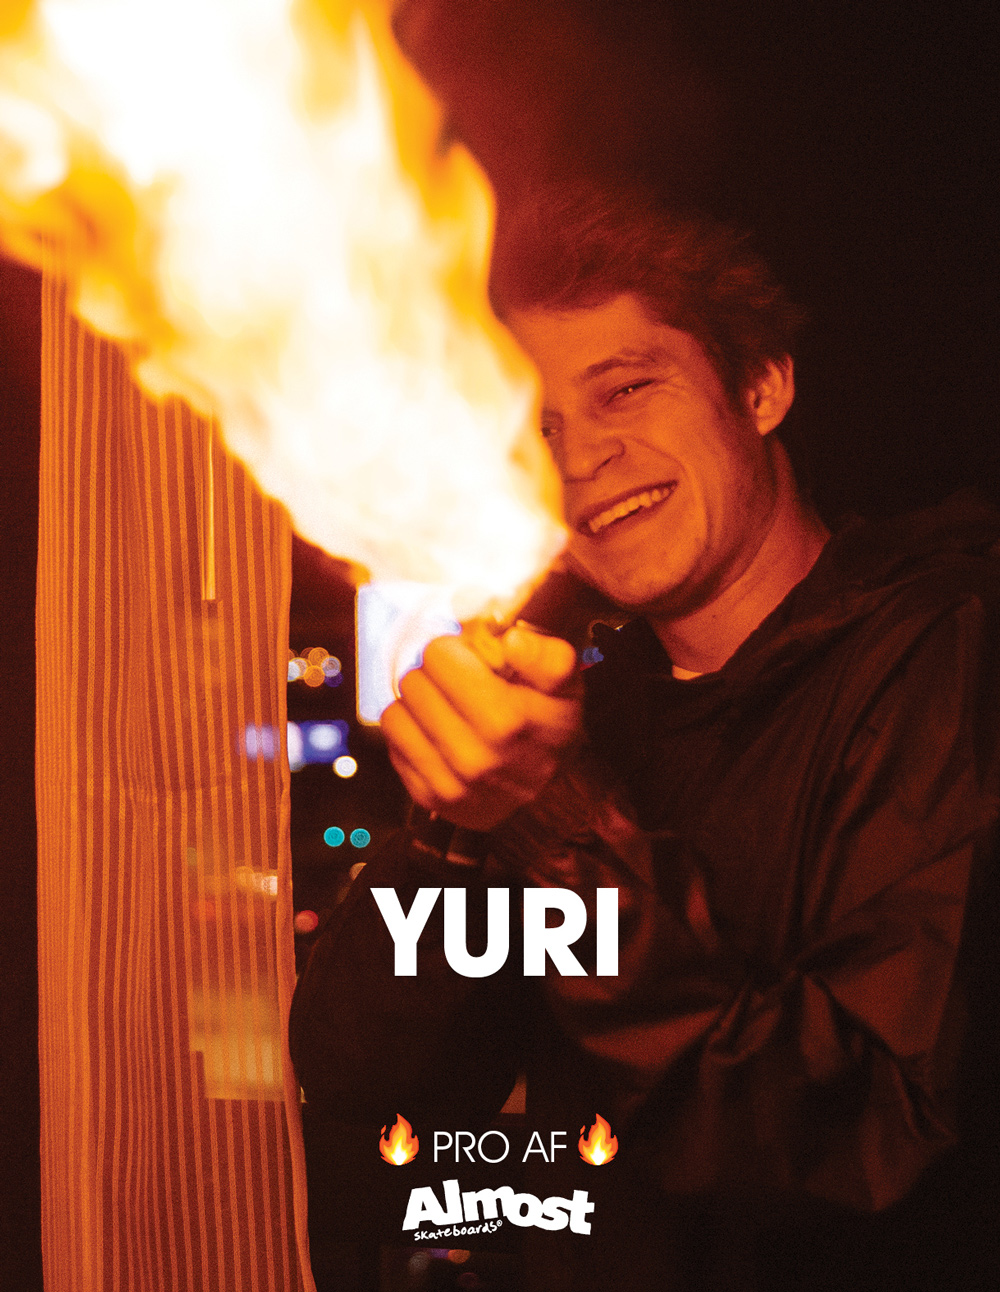 ALM_YURI_PRO_FIRE_THRASHER_web.jpg